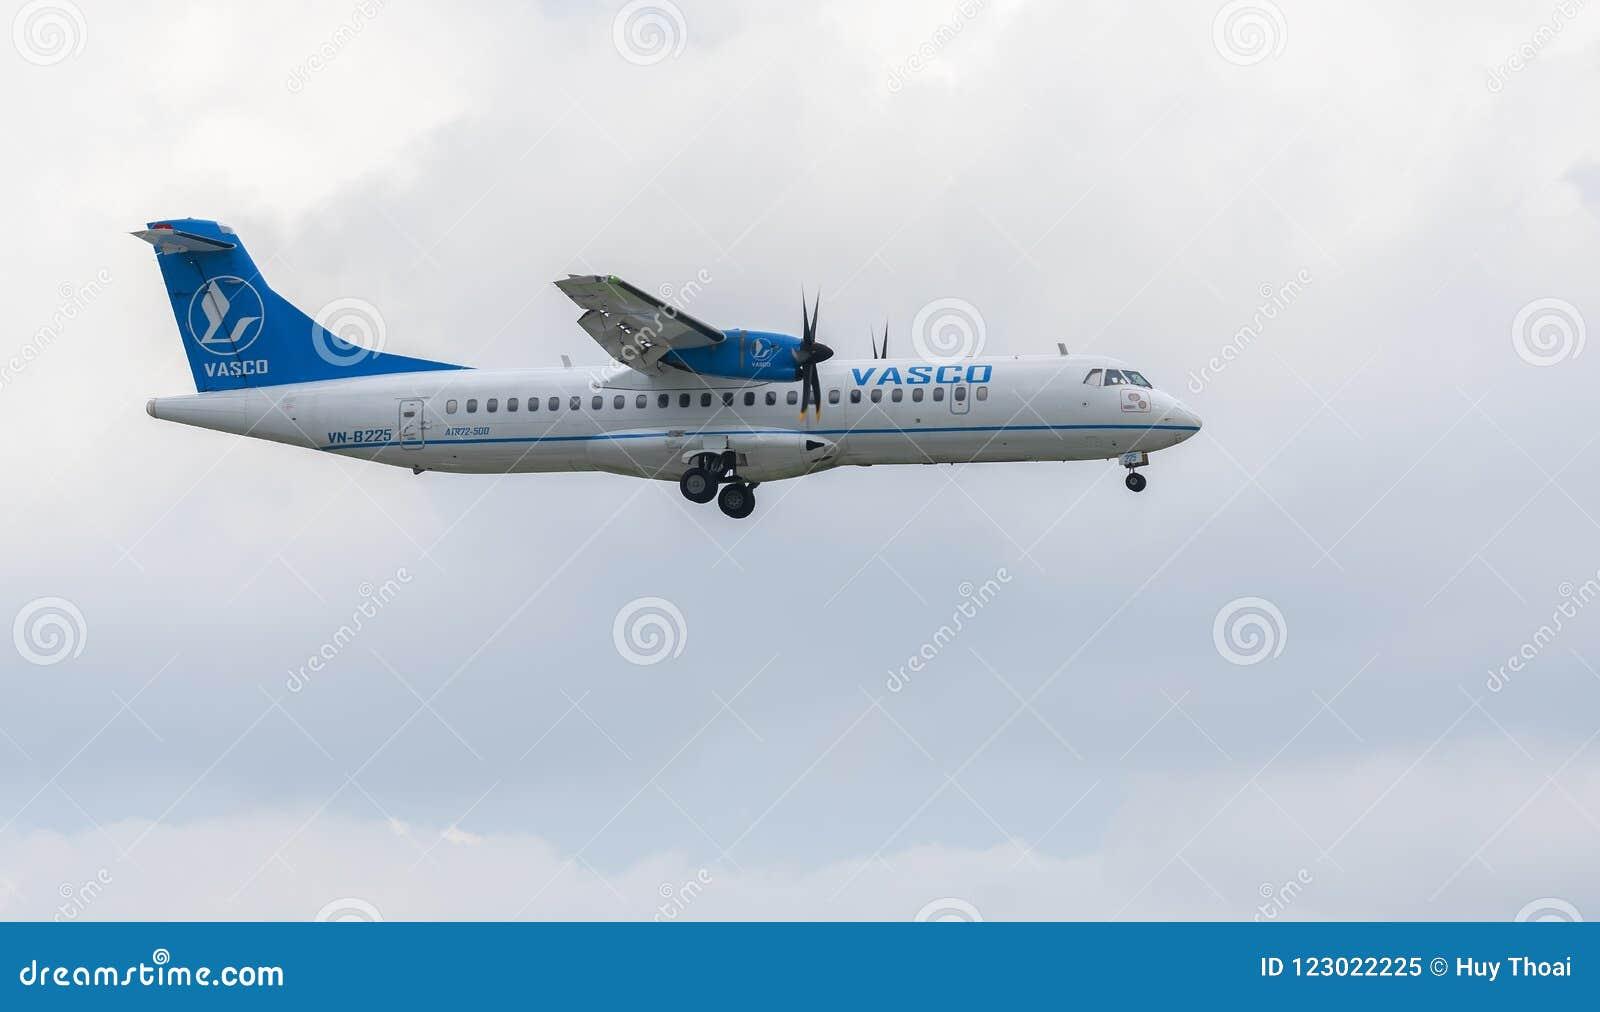 Vasco-Flugzeug mit Landung der Ausrichtung Atr72 bei Tan Son Nhat International Airport